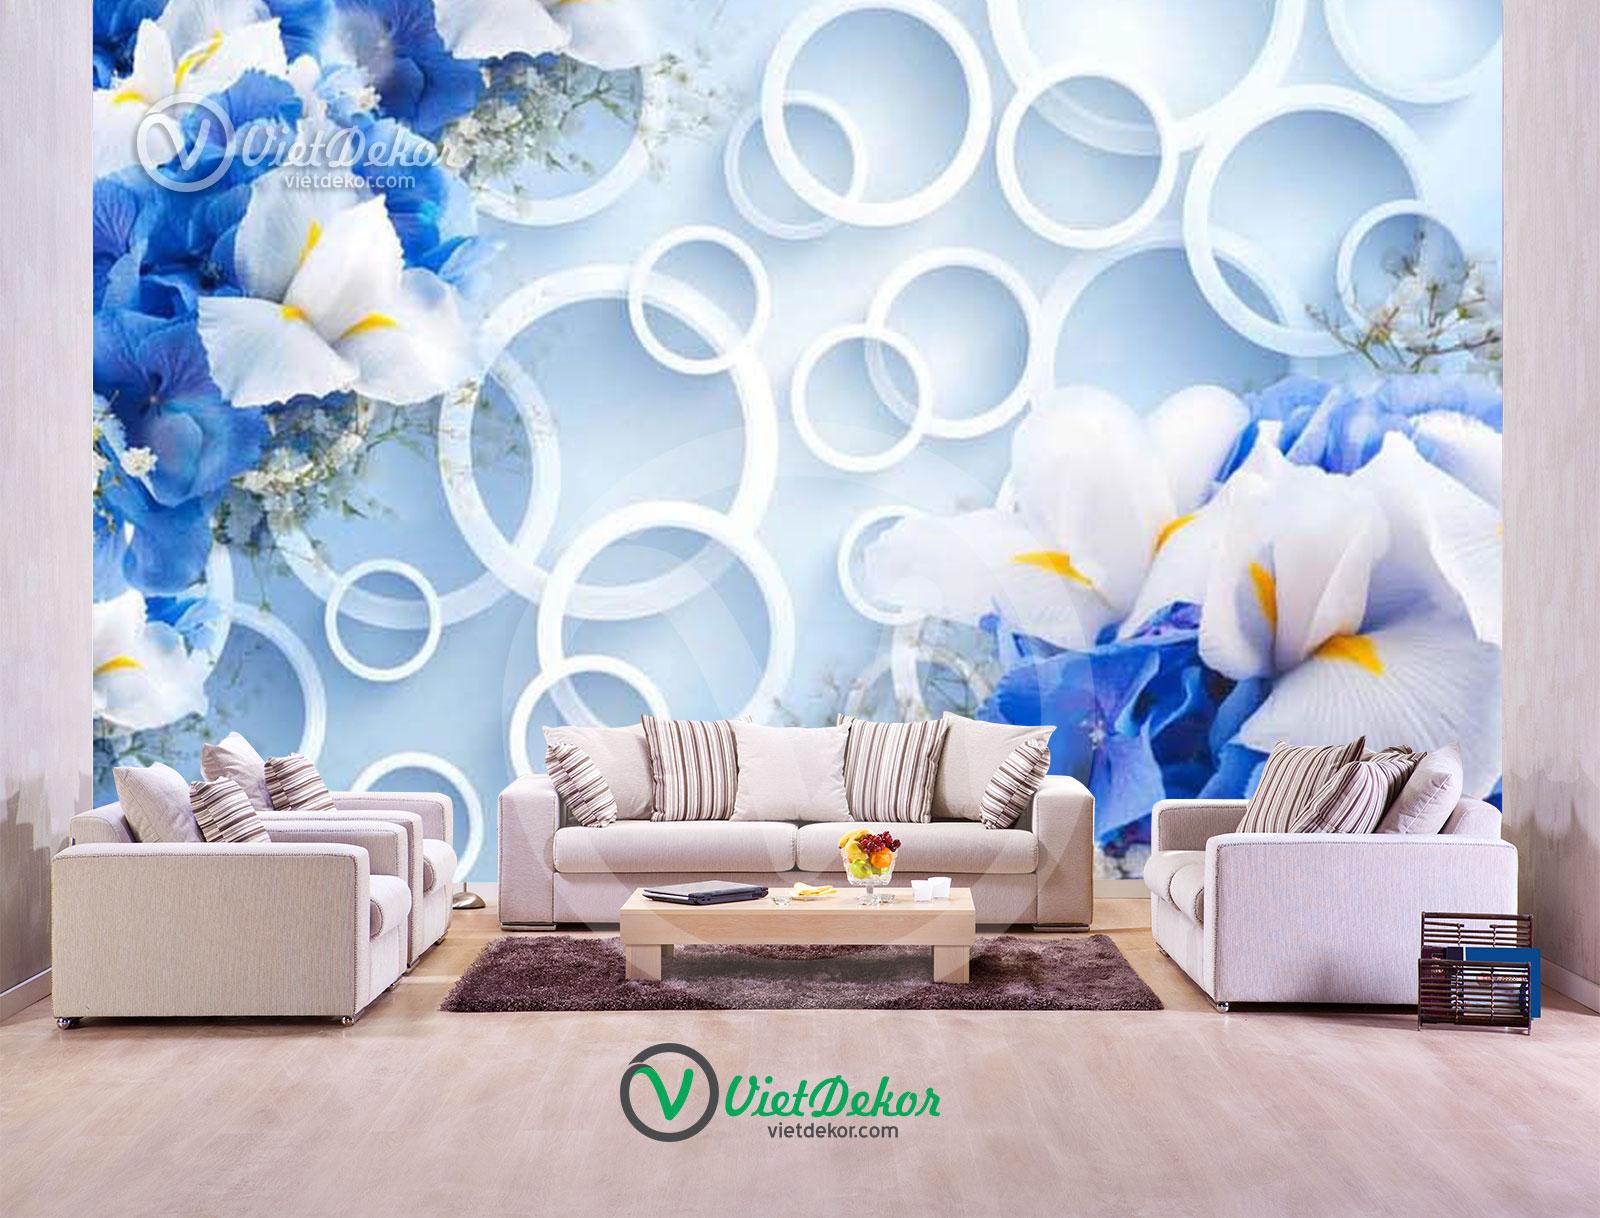 Tranh hoa dán tường 3d